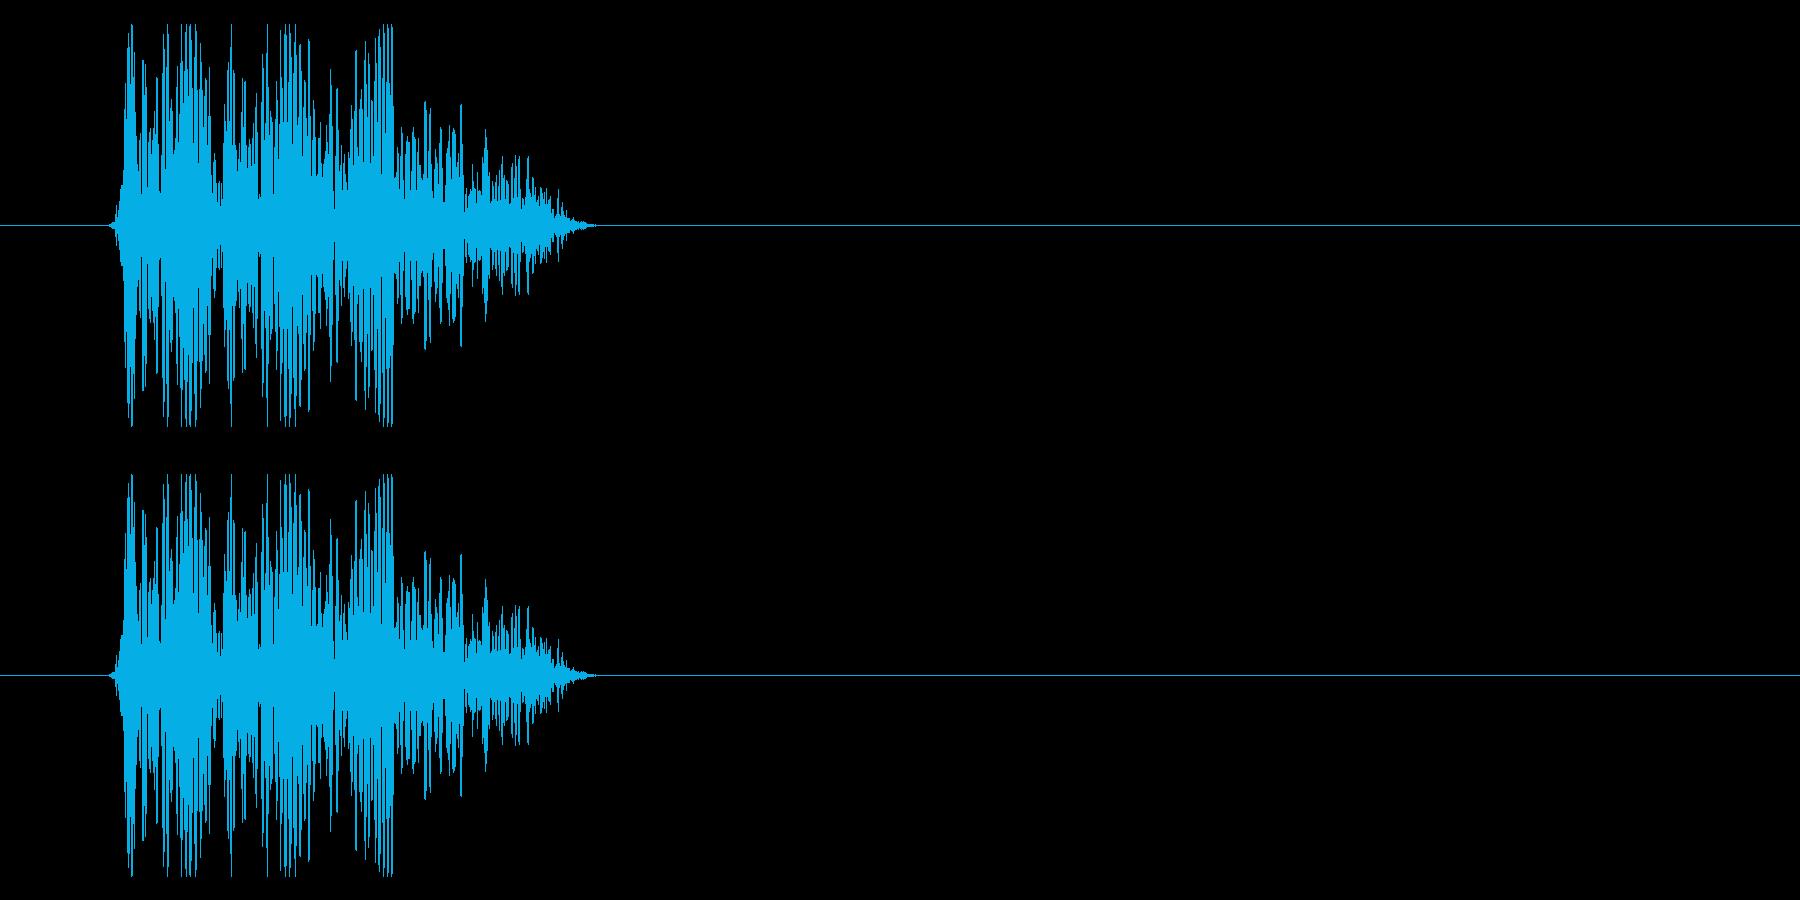 SNES 格闘05-09(倒れる)の再生済みの波形